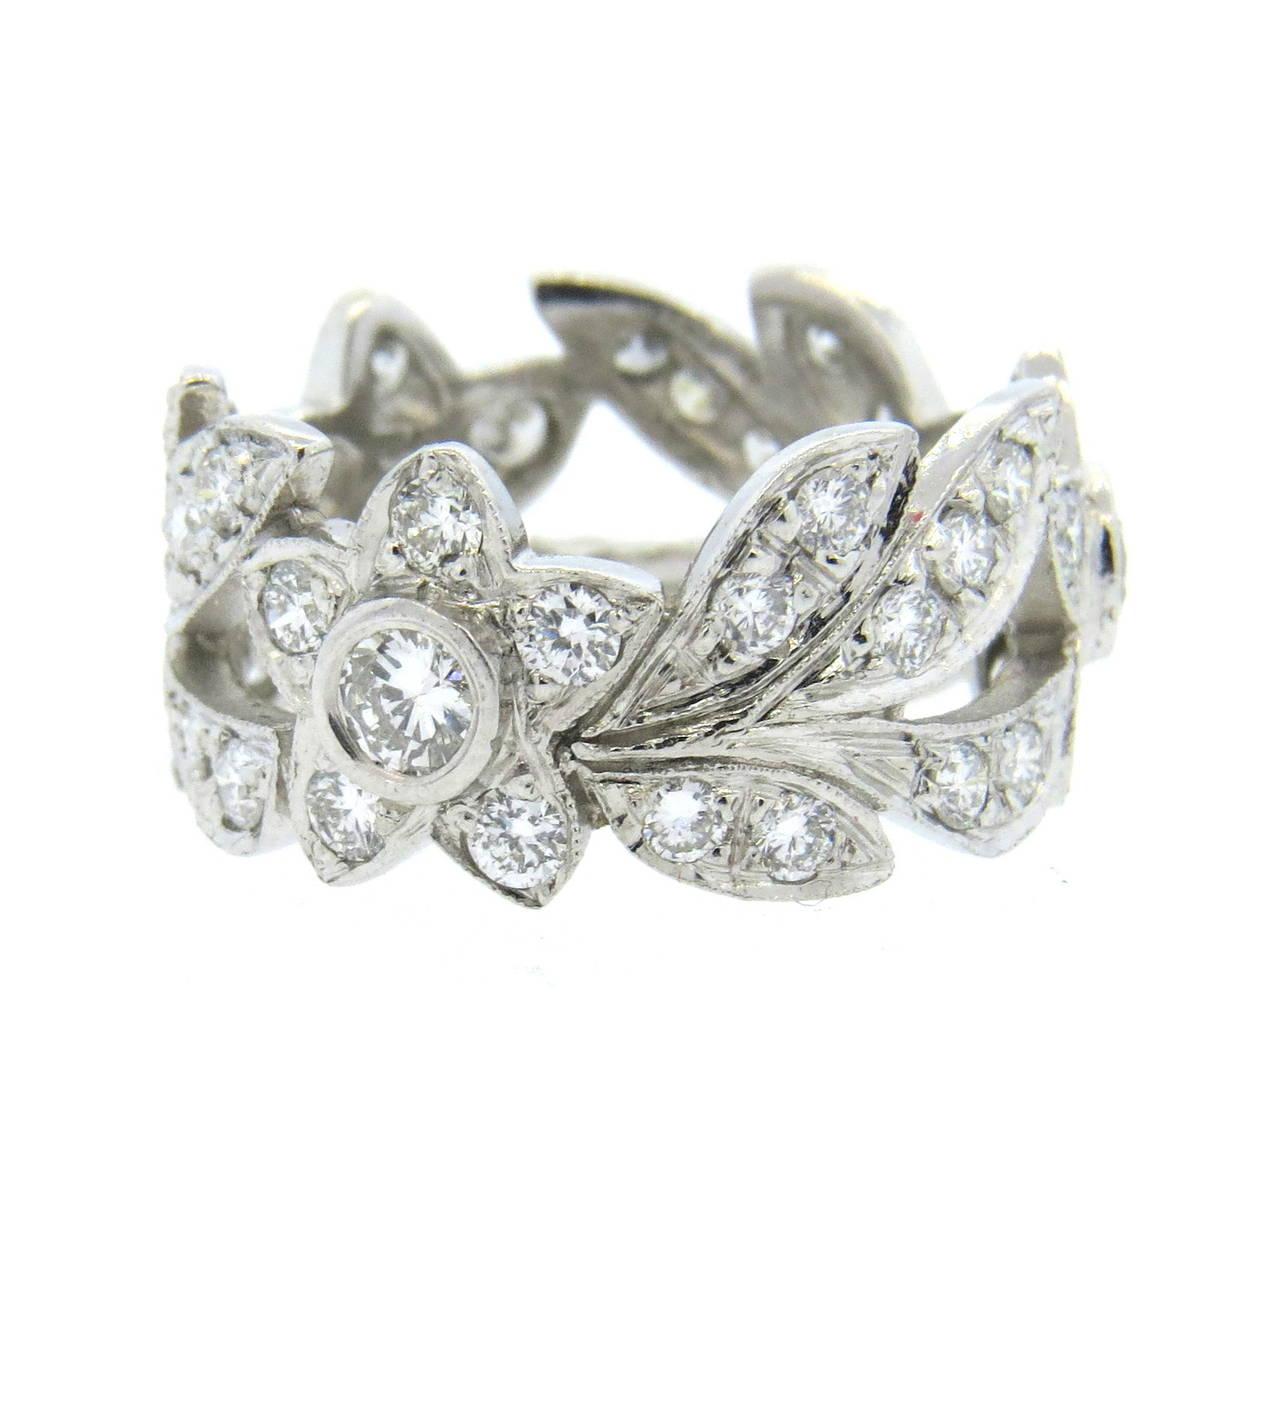 Leaf Band Enement Ring | Diamond Platinum Flower And Leaf Motif Band Ring At 1stdibs